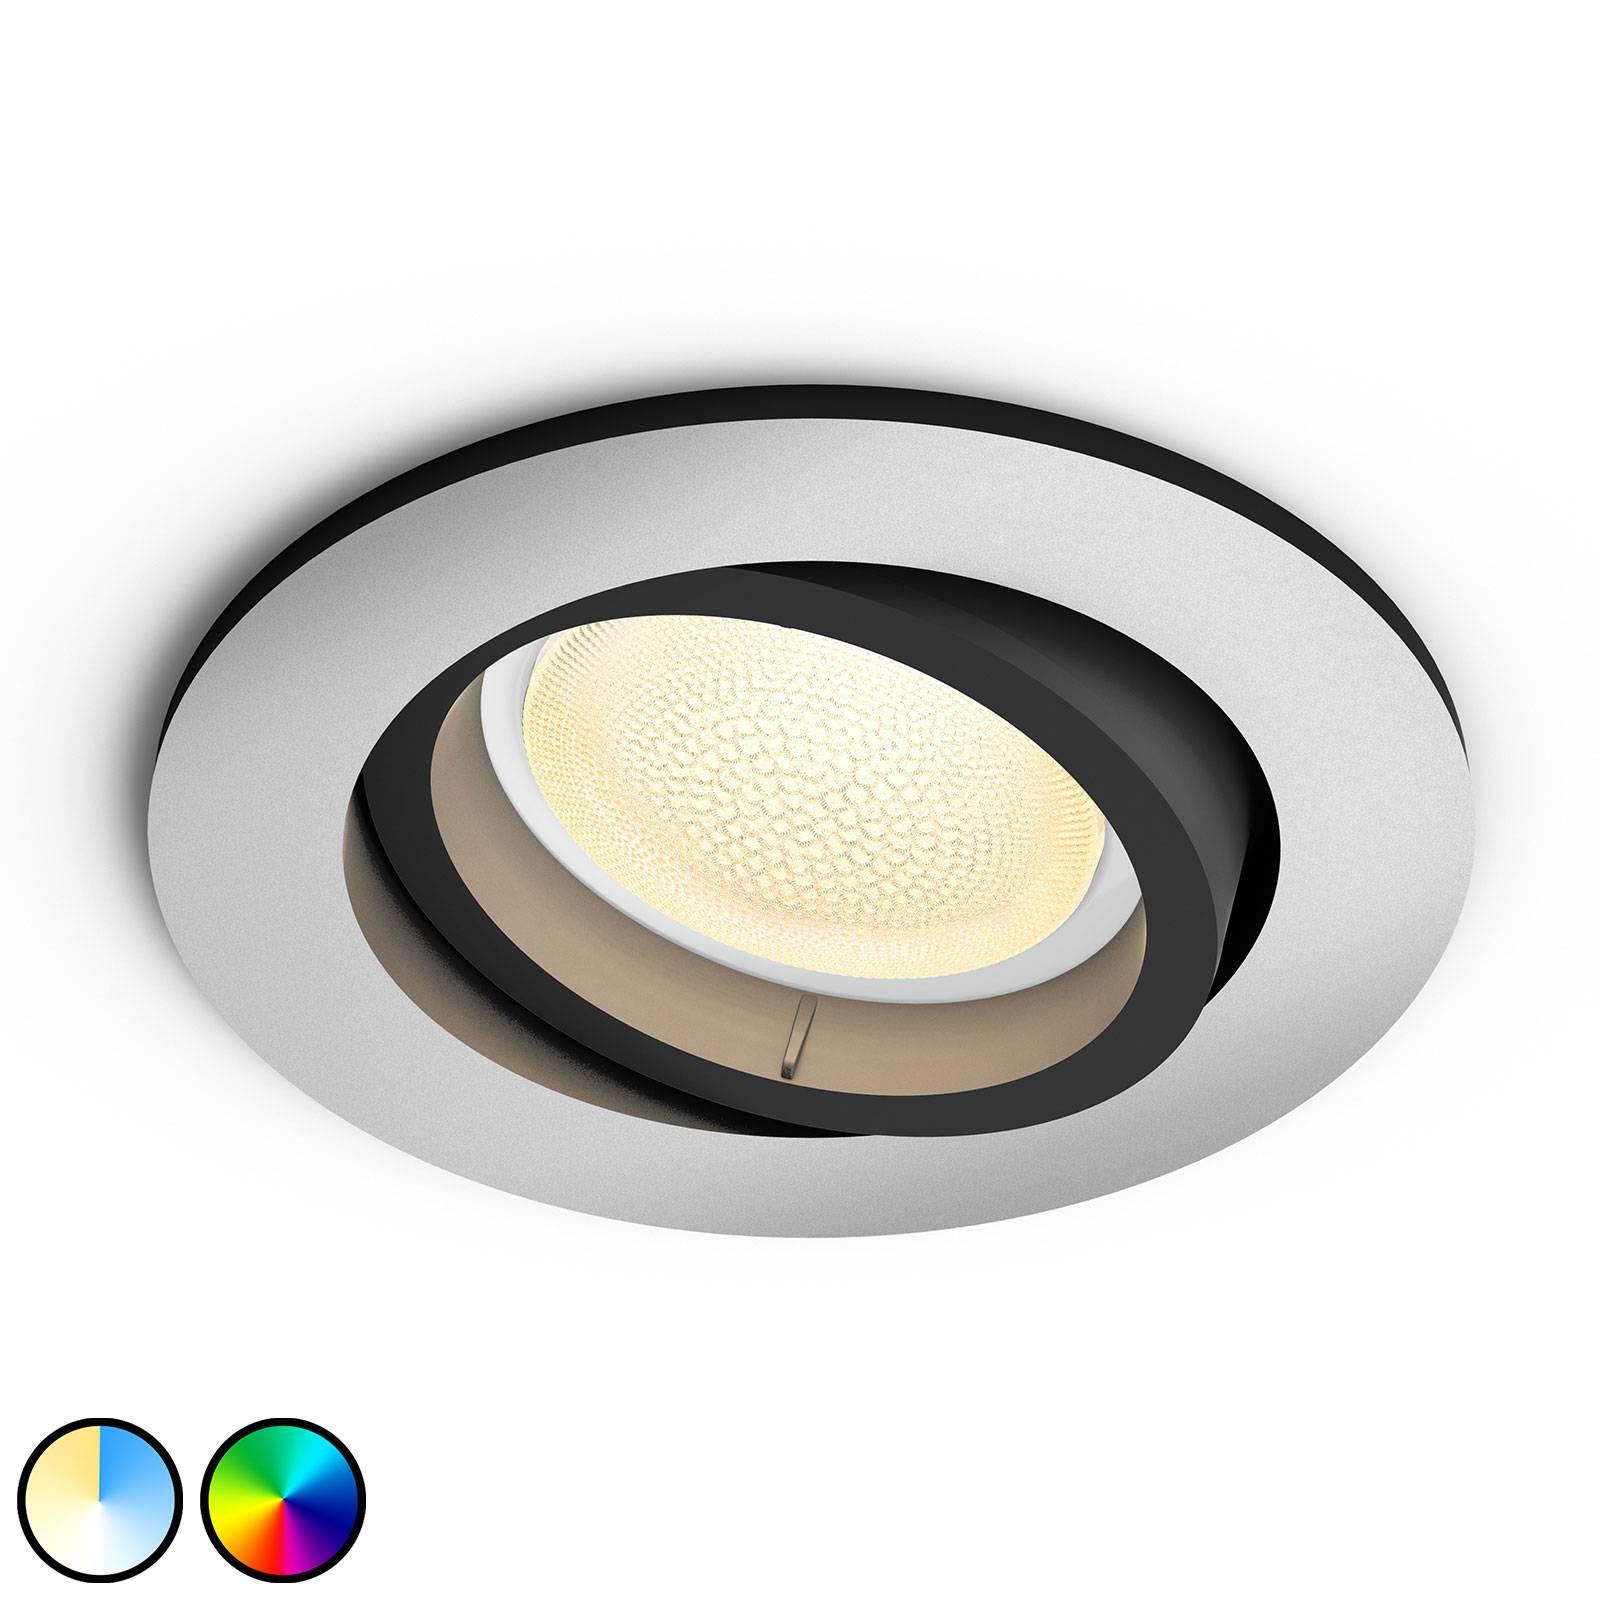 Philips Hue Centura upot. LED-spotti, alumiinia